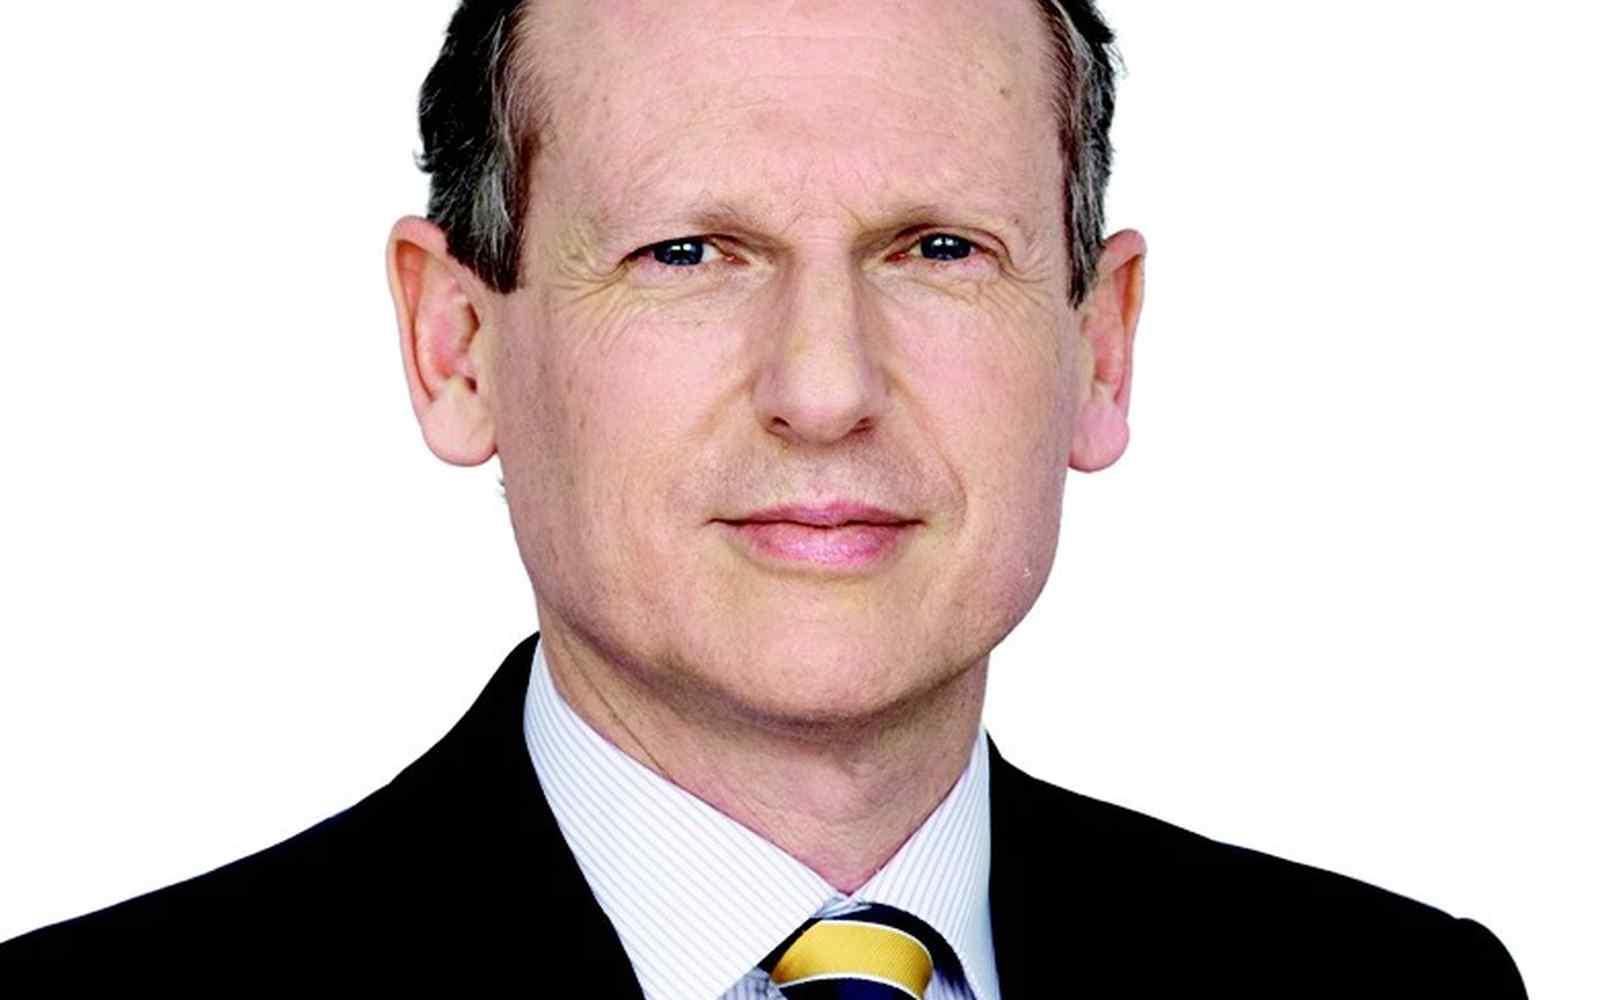 Alan Millard, Chairman and CEO, Hiscox Underwriting subsidiary